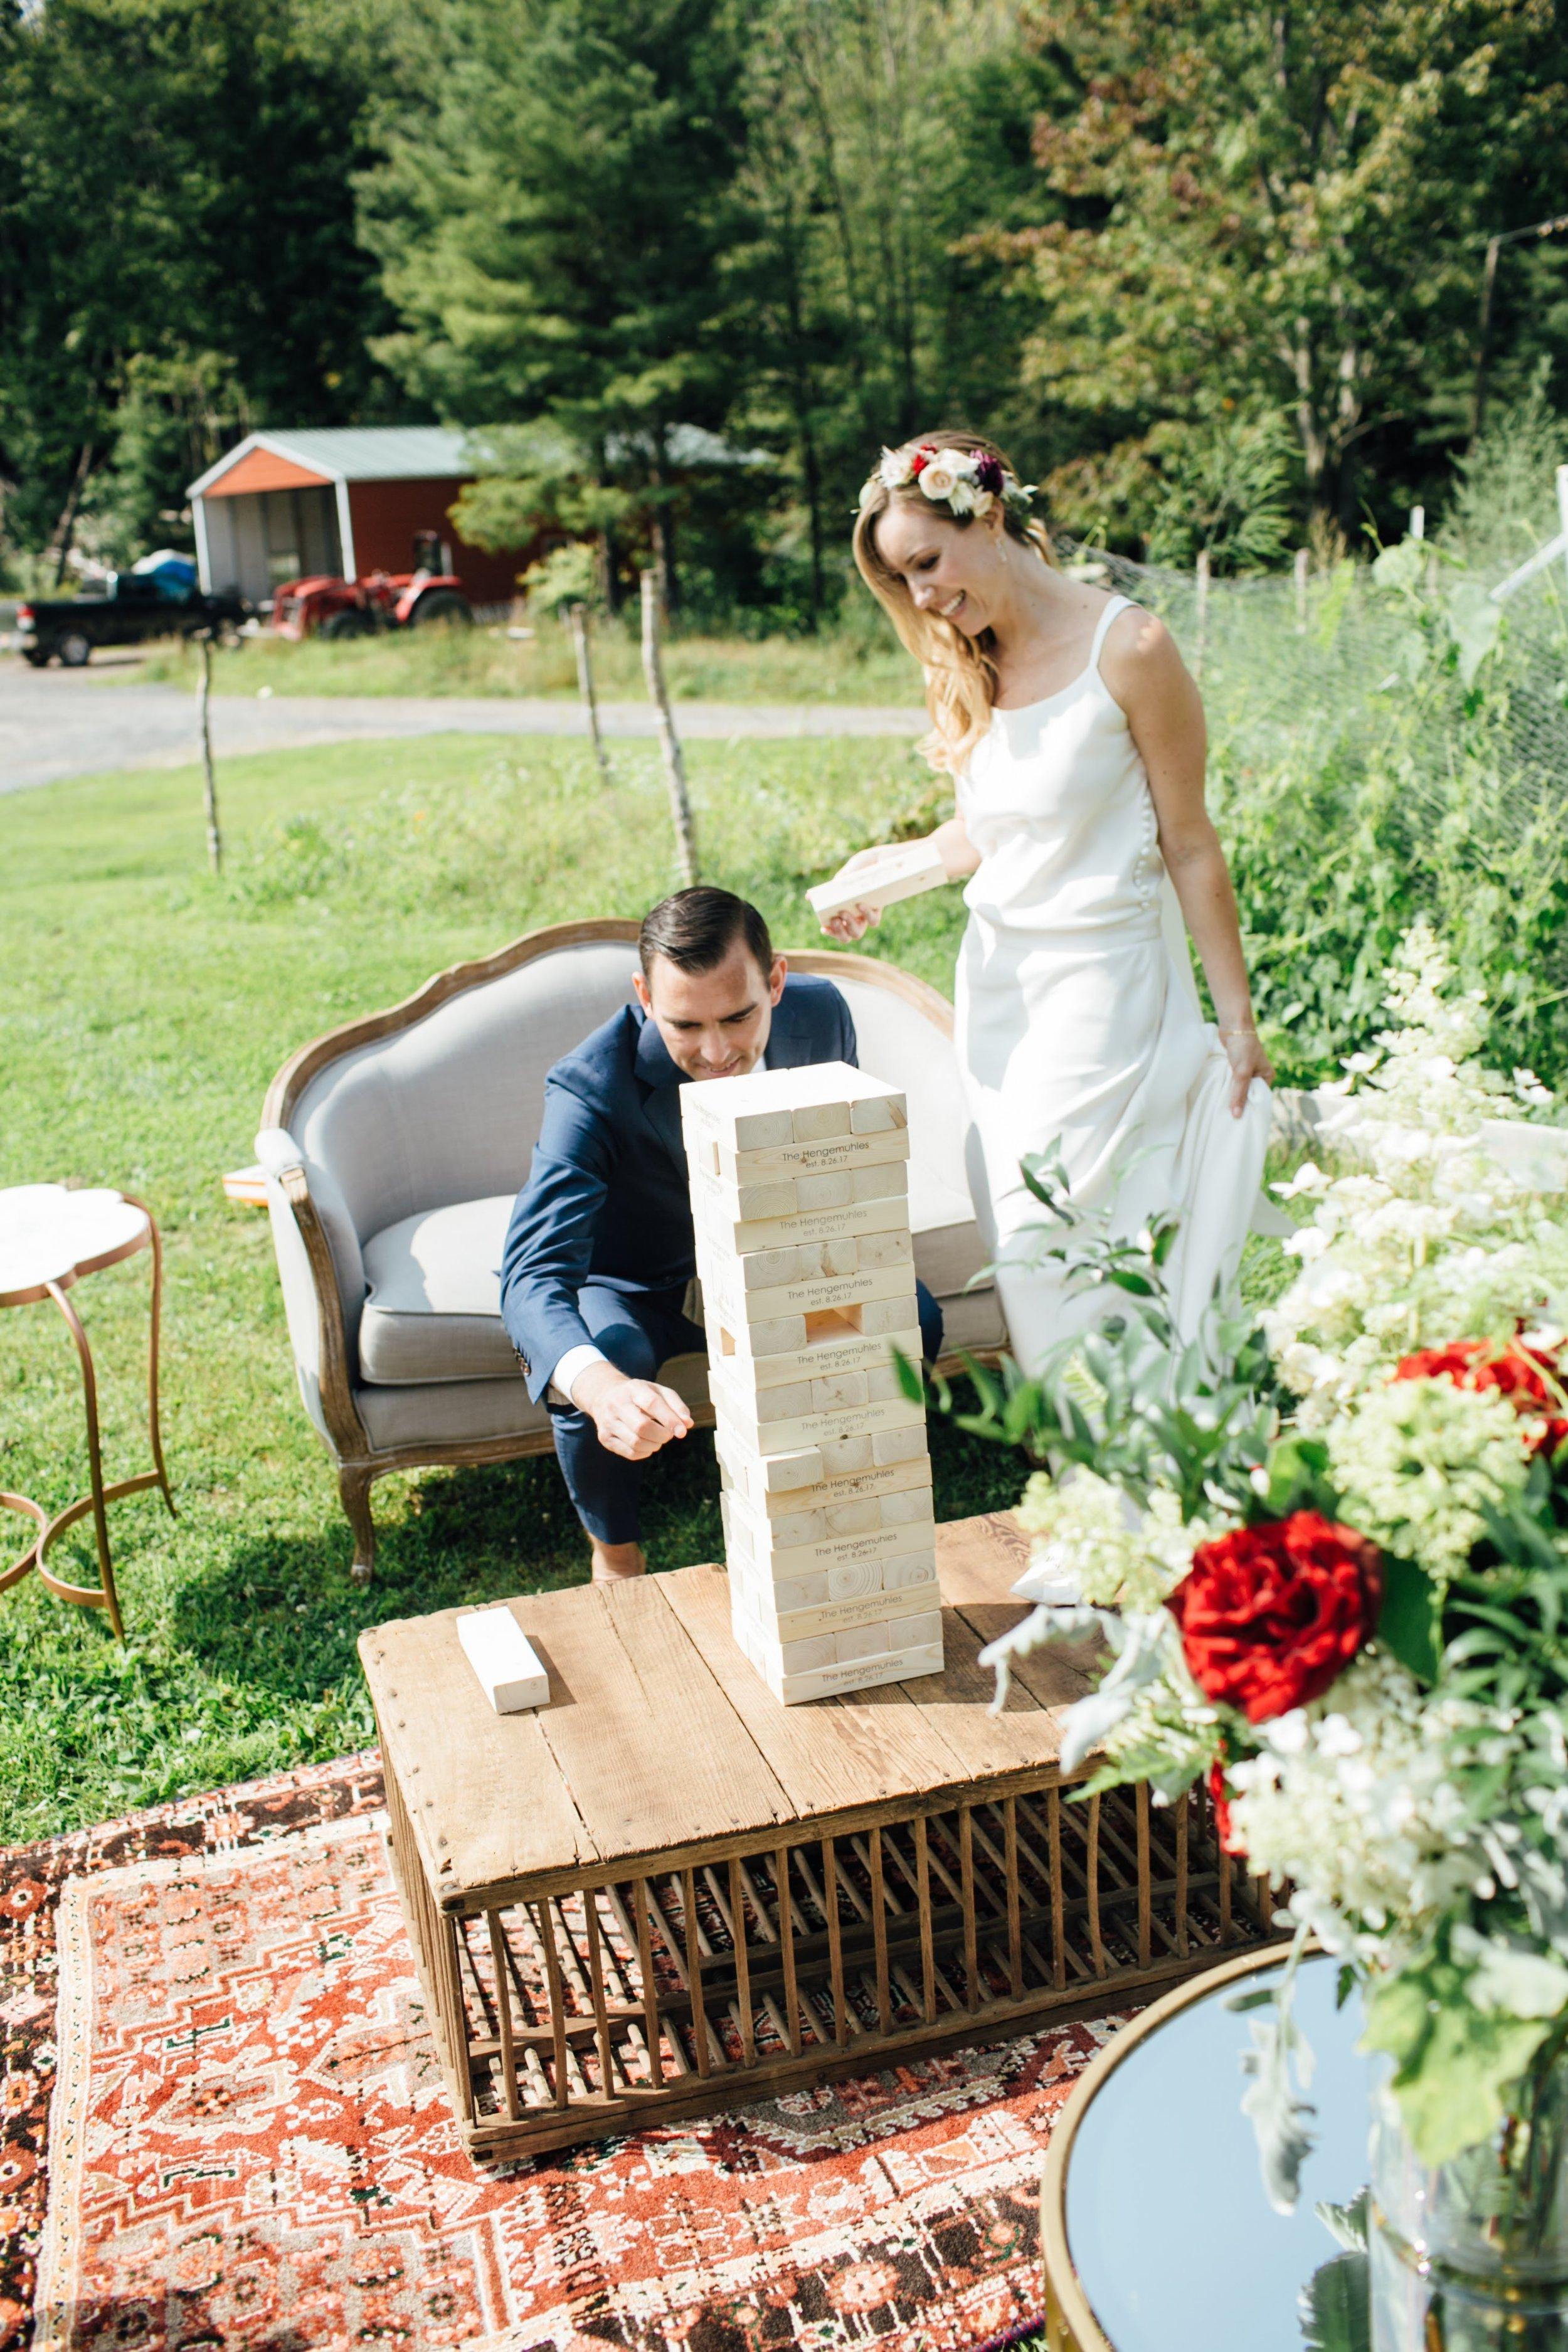 Courtney + Matt Blenheim Hill Farm Catskills NY Wedding Veronica Lola Photography 2017-188.jpg